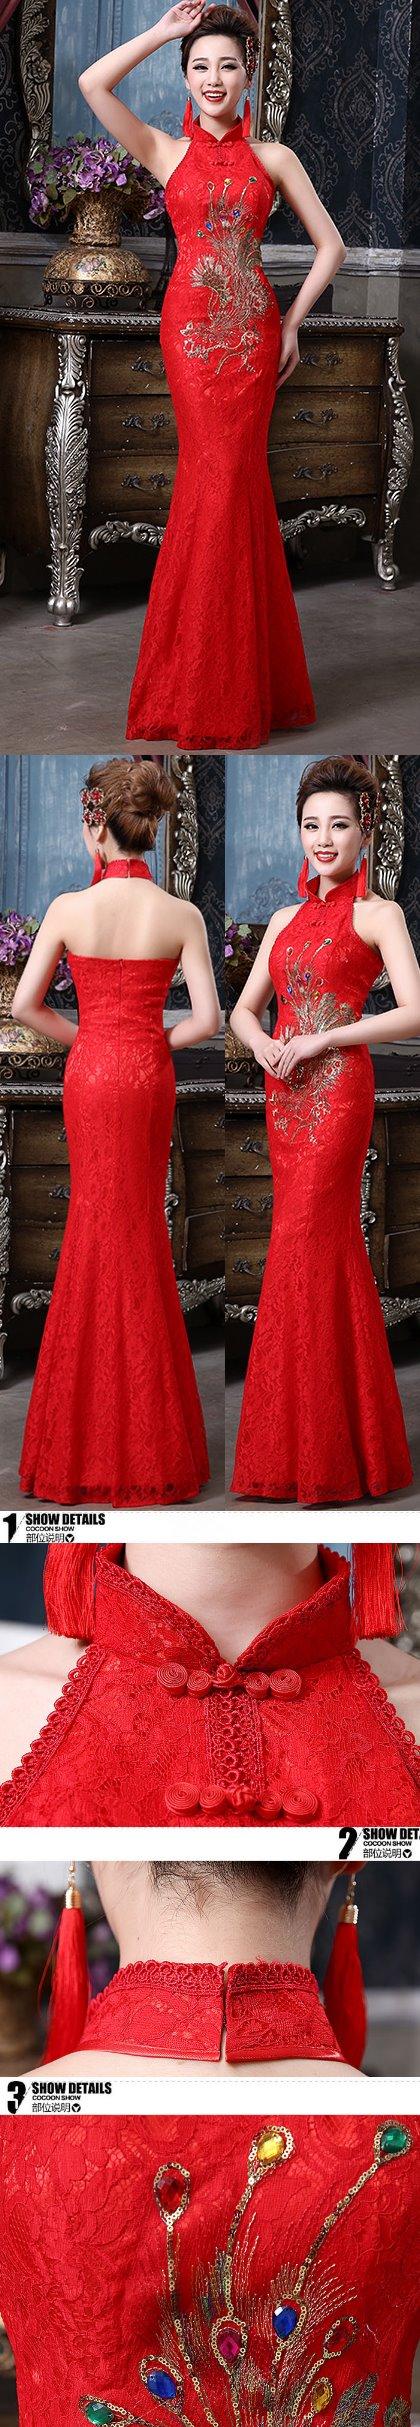 Cut-in Shoulders Bareback Long-length Bridal Cheongsam (RM)